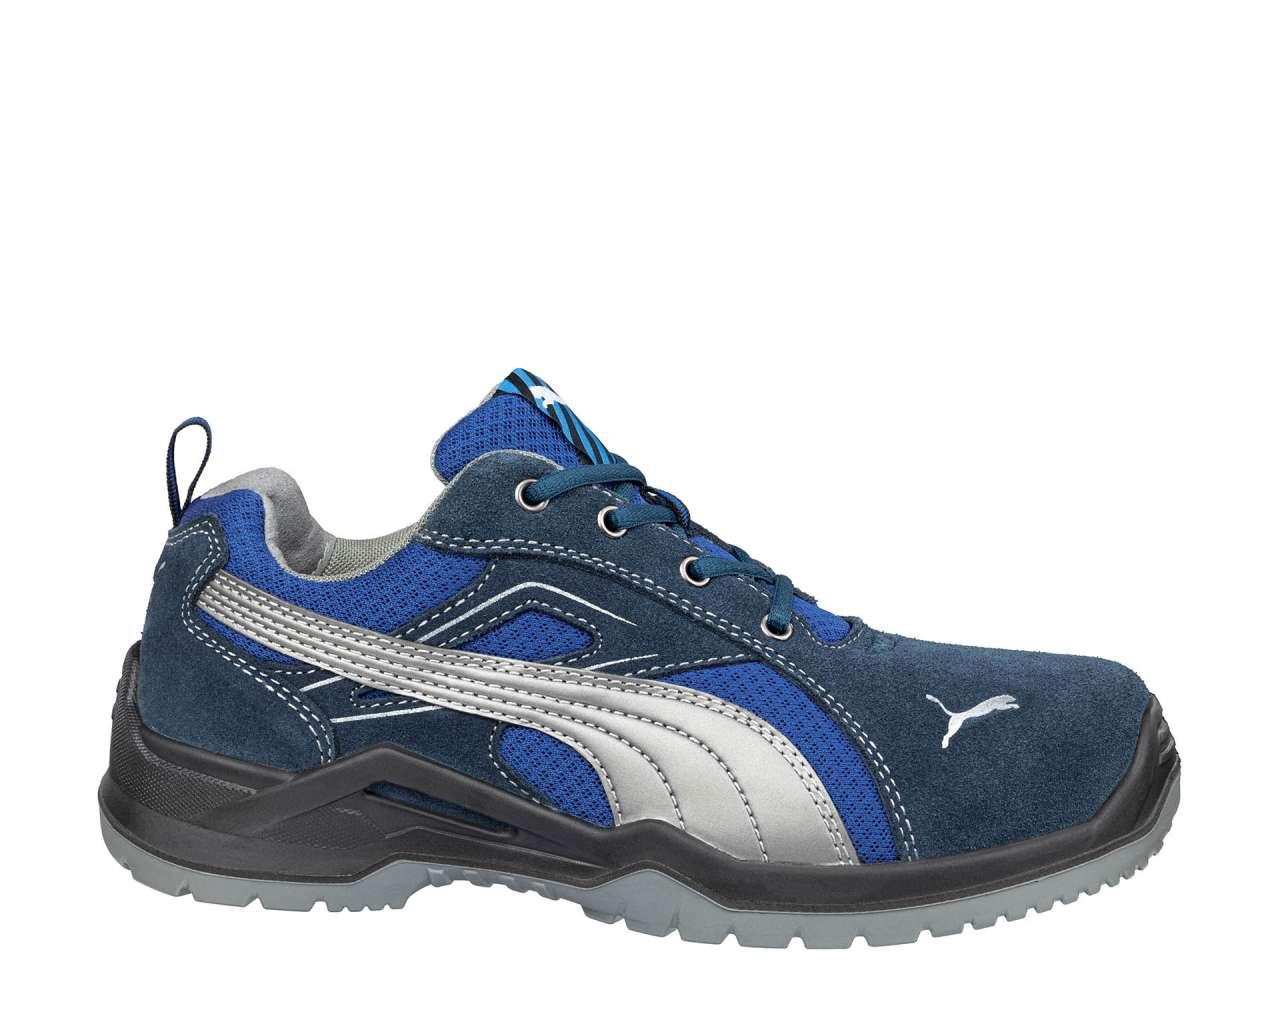 Puma Omni BLUE LOW S1P SRC